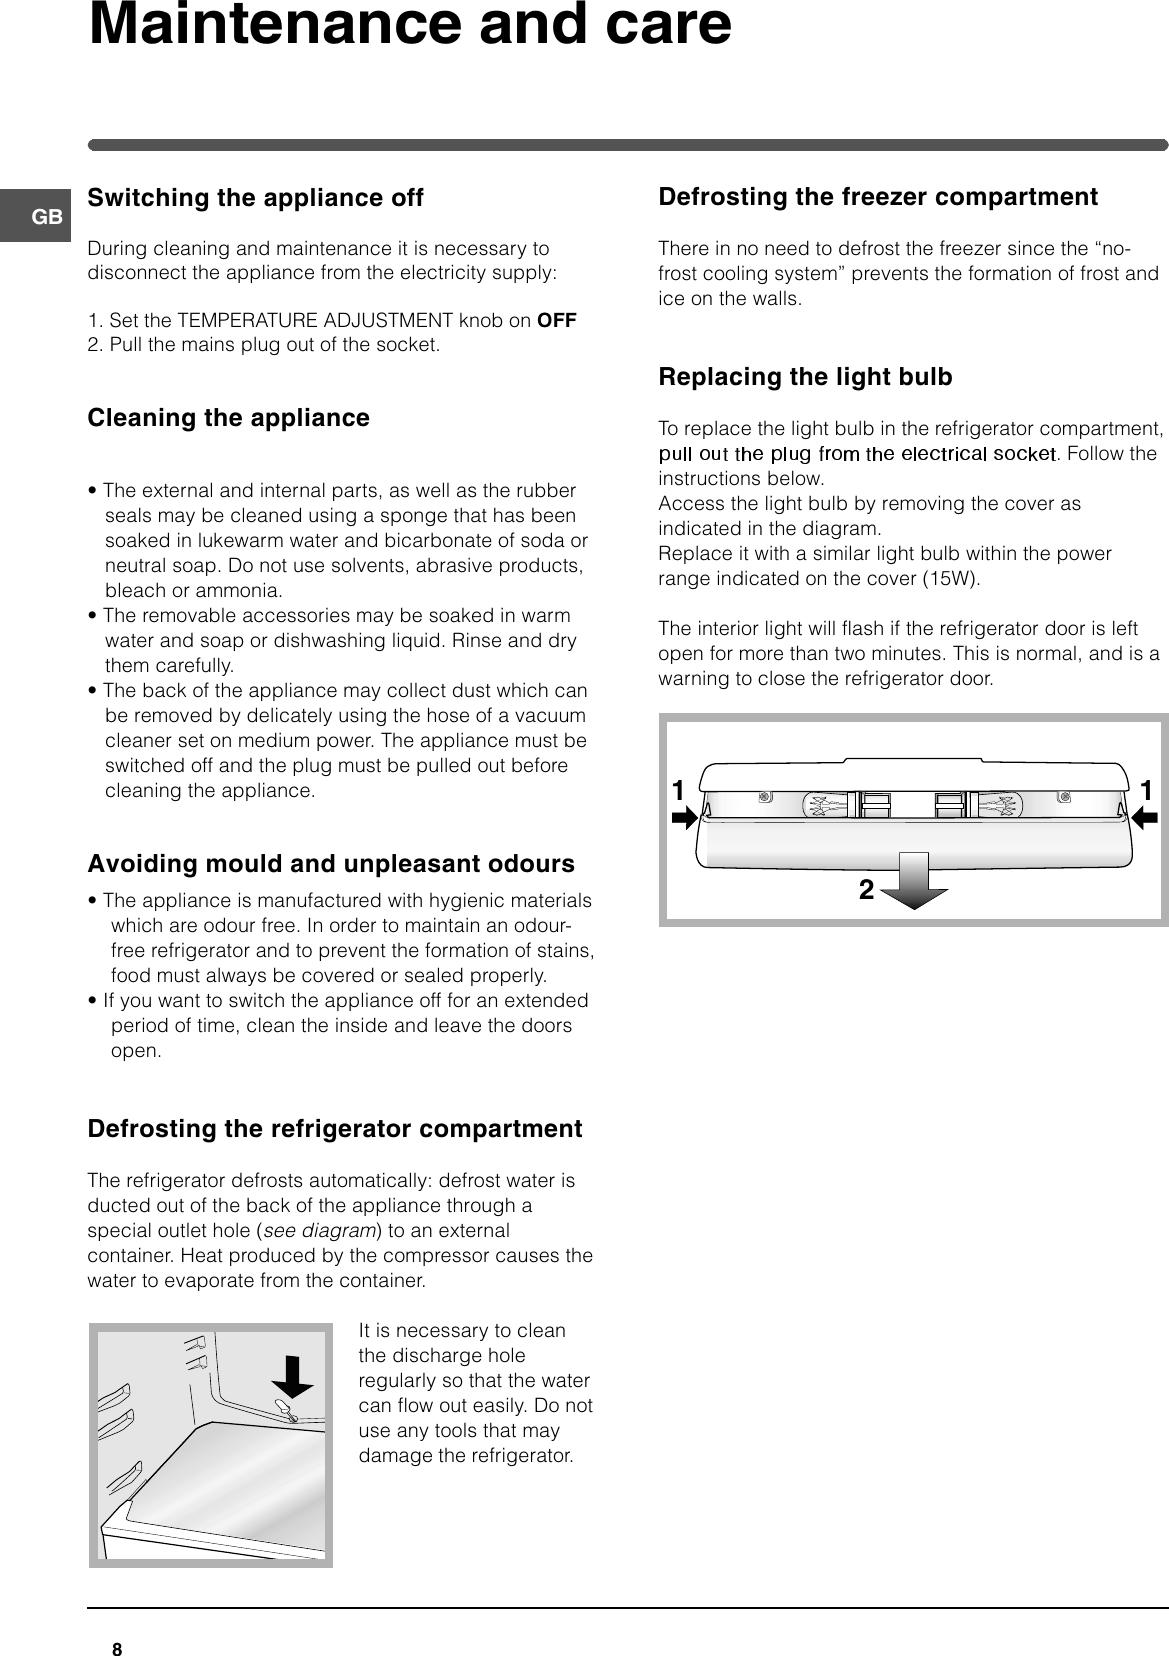 Hotpoint Ffp187B Users Manual 44802gb